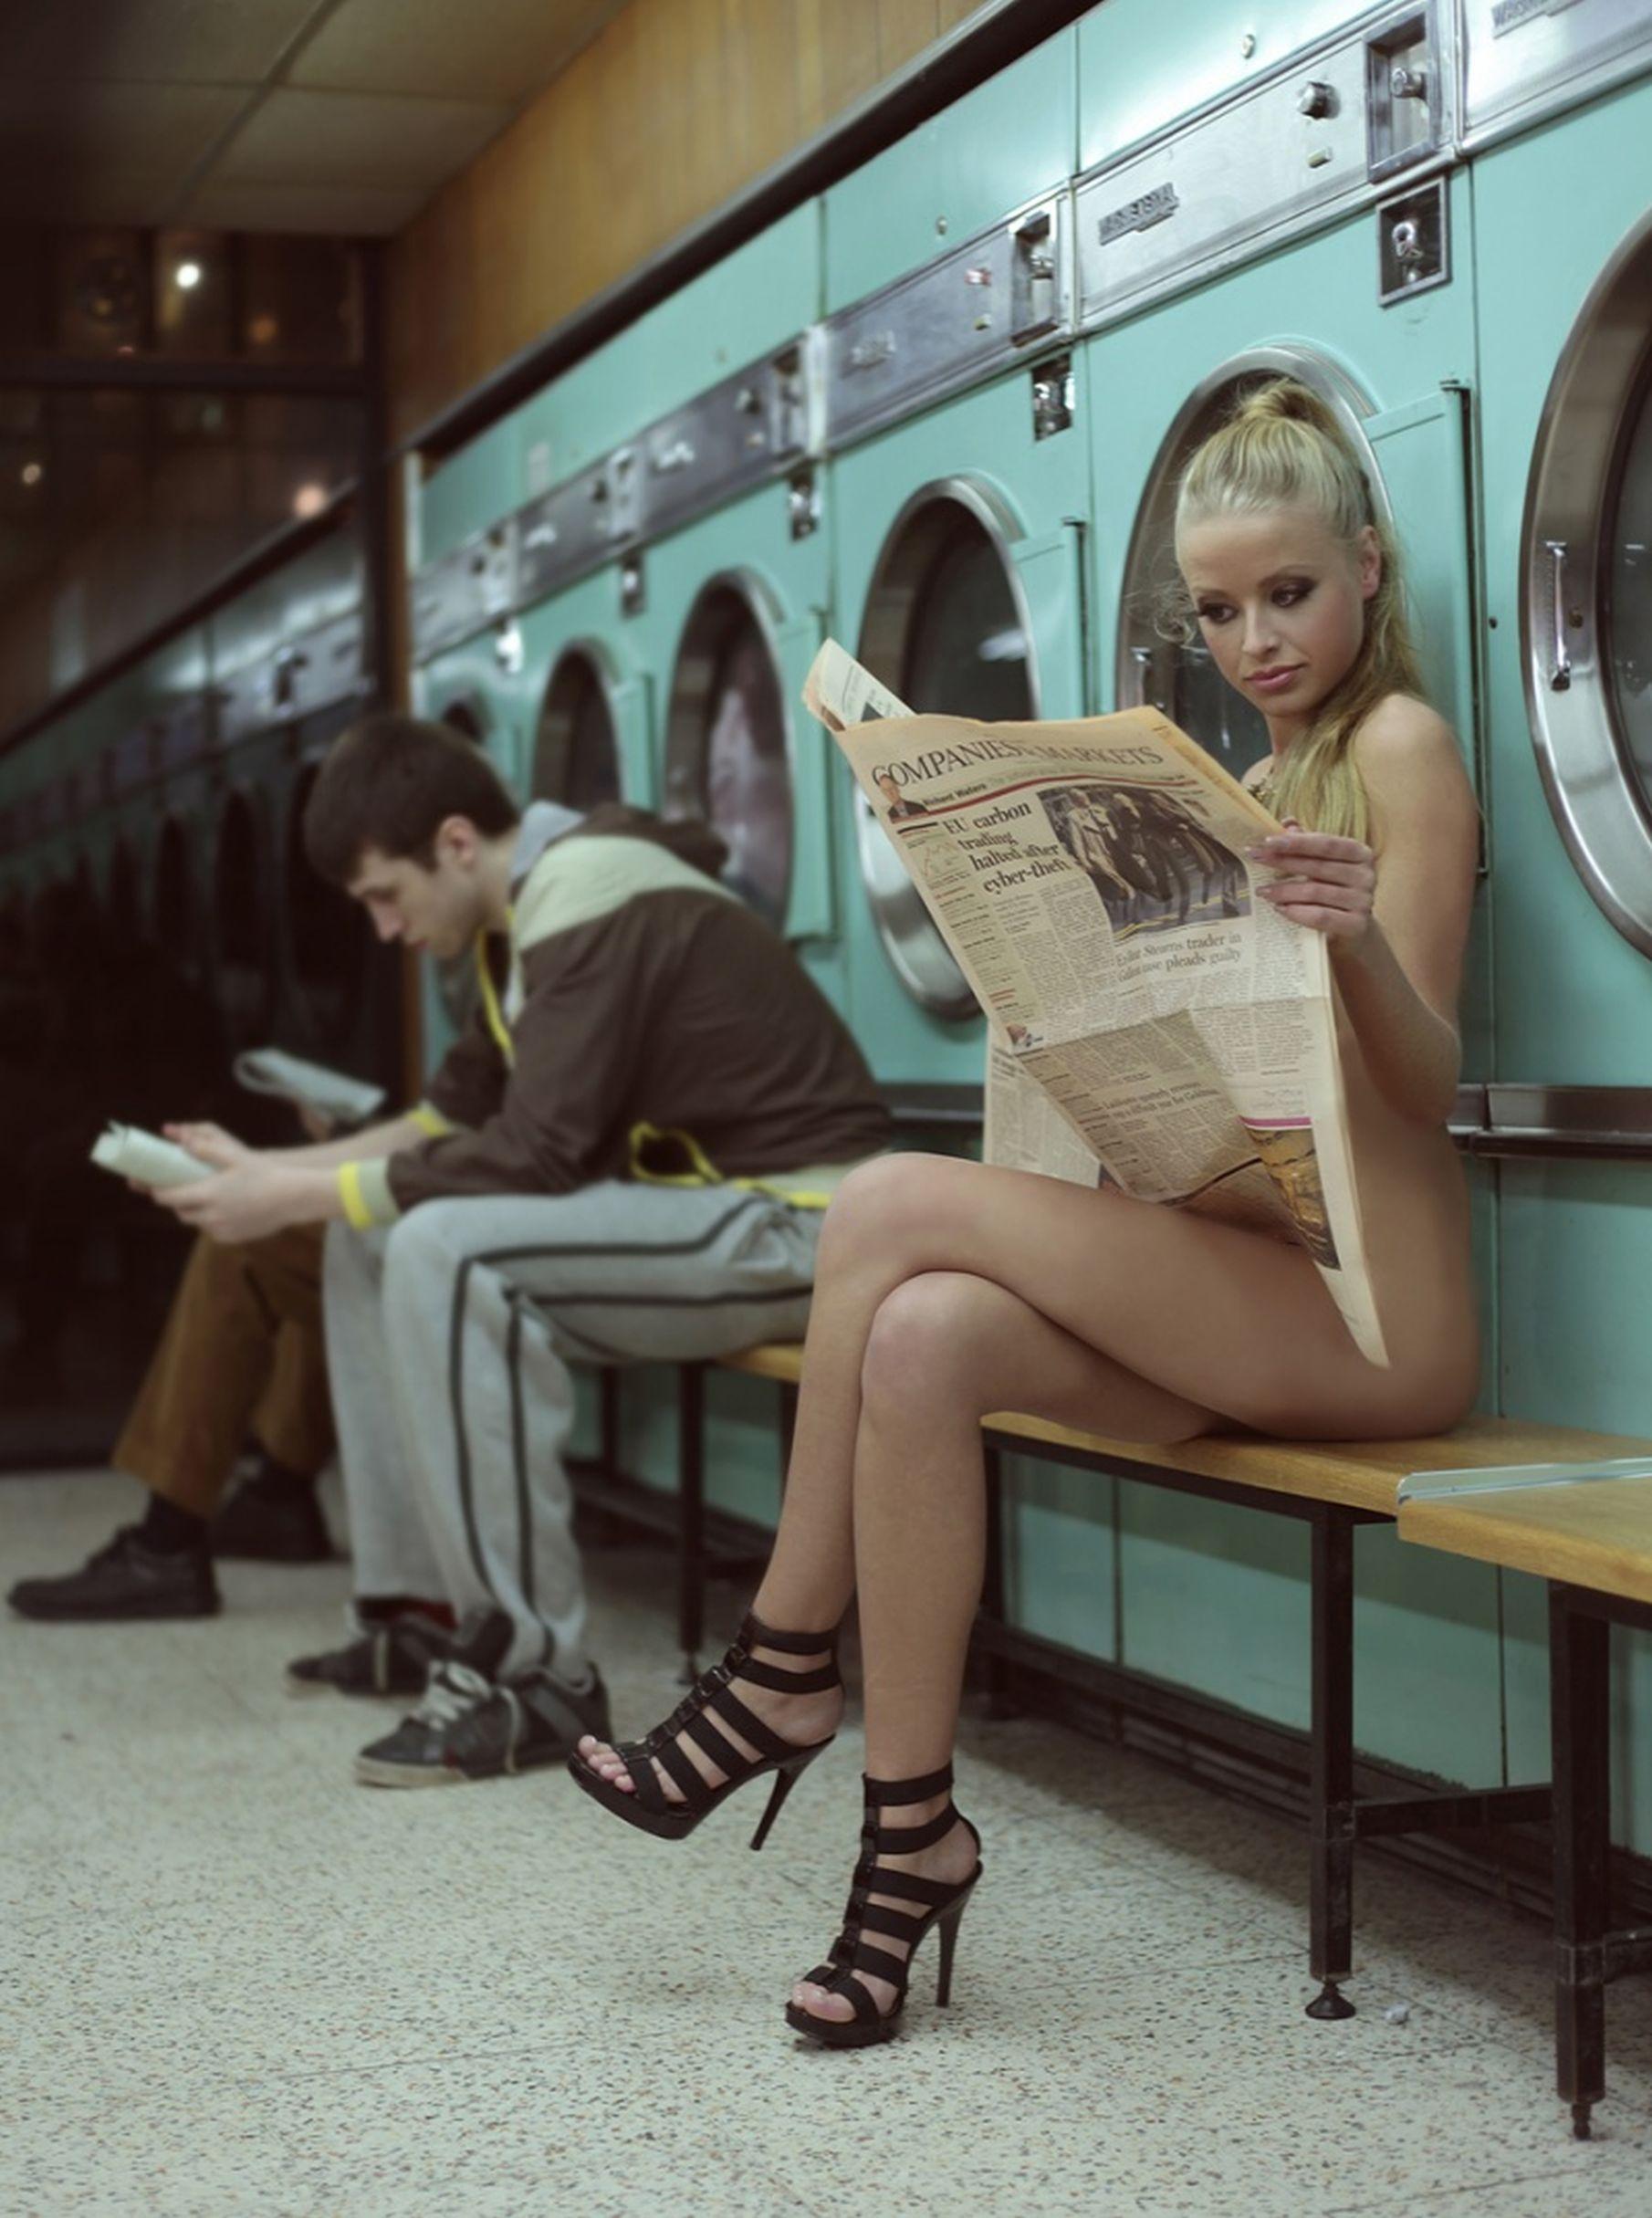 laundry-girls-nude-washing-machine-photo-mix-90